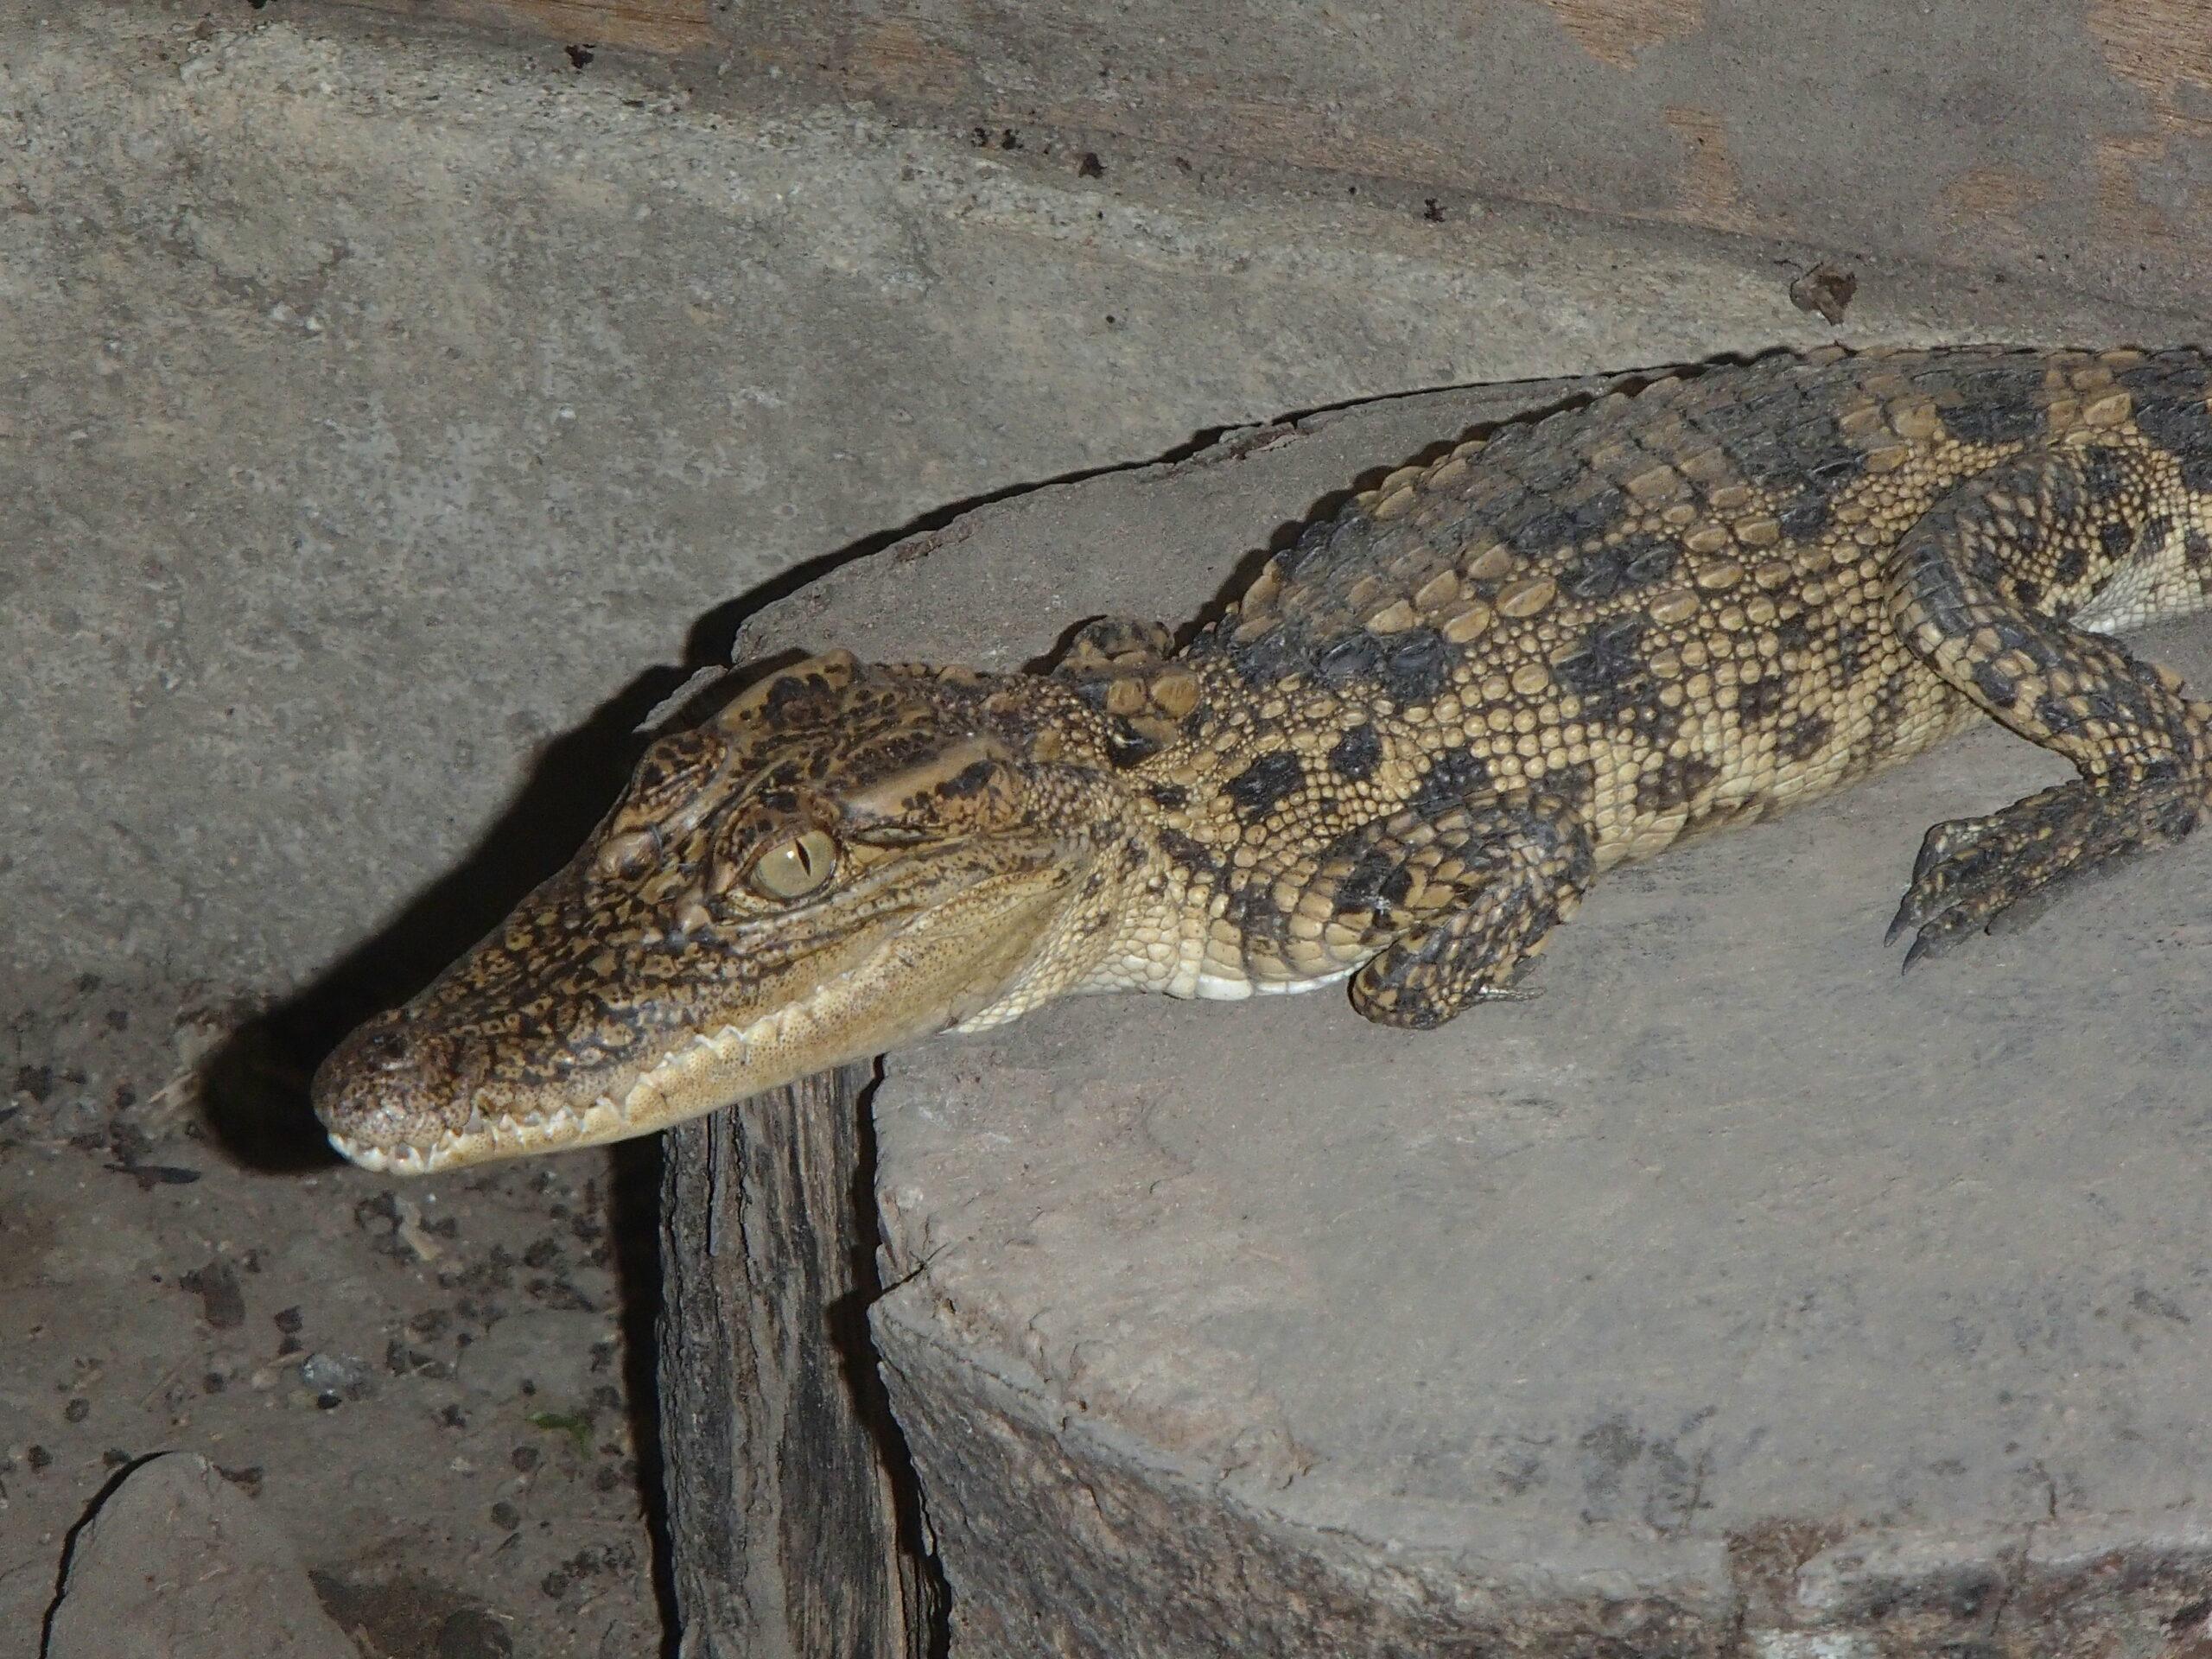 Ensuring a future for the Critically Endangered Siamese Crocodiles